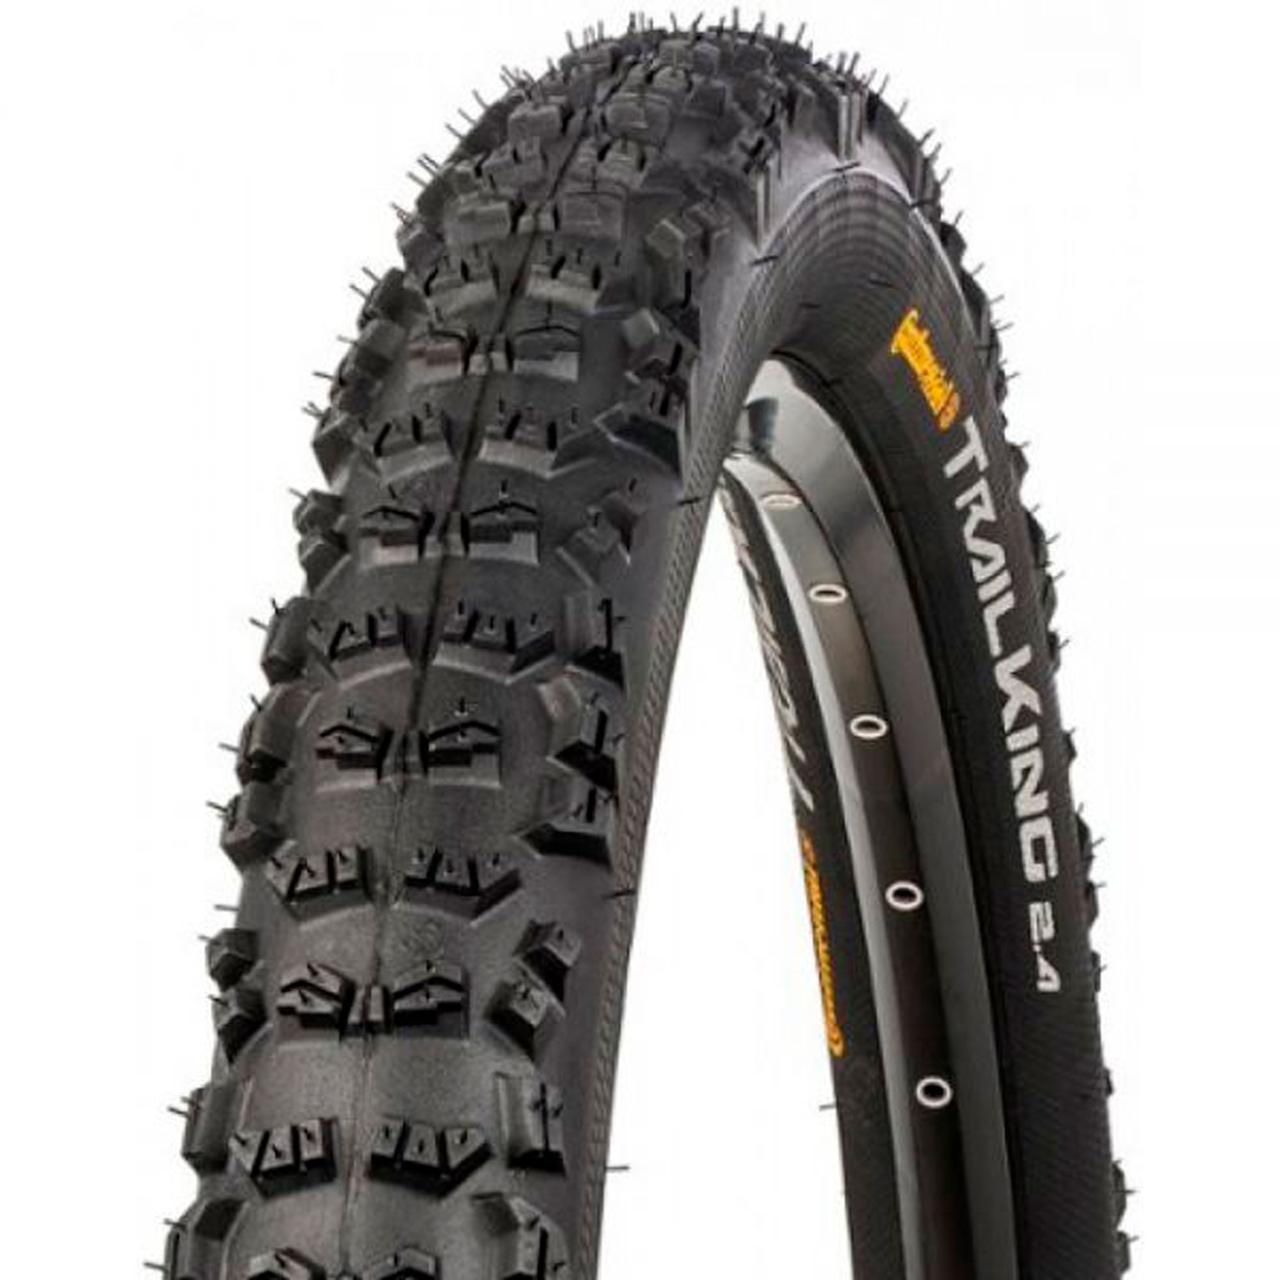 "Покрышка Continental Trail King 2.2, 27.5""x2.20, 55-584, Foldable,  PureGrip, Performance, Skin, черный (ST)"